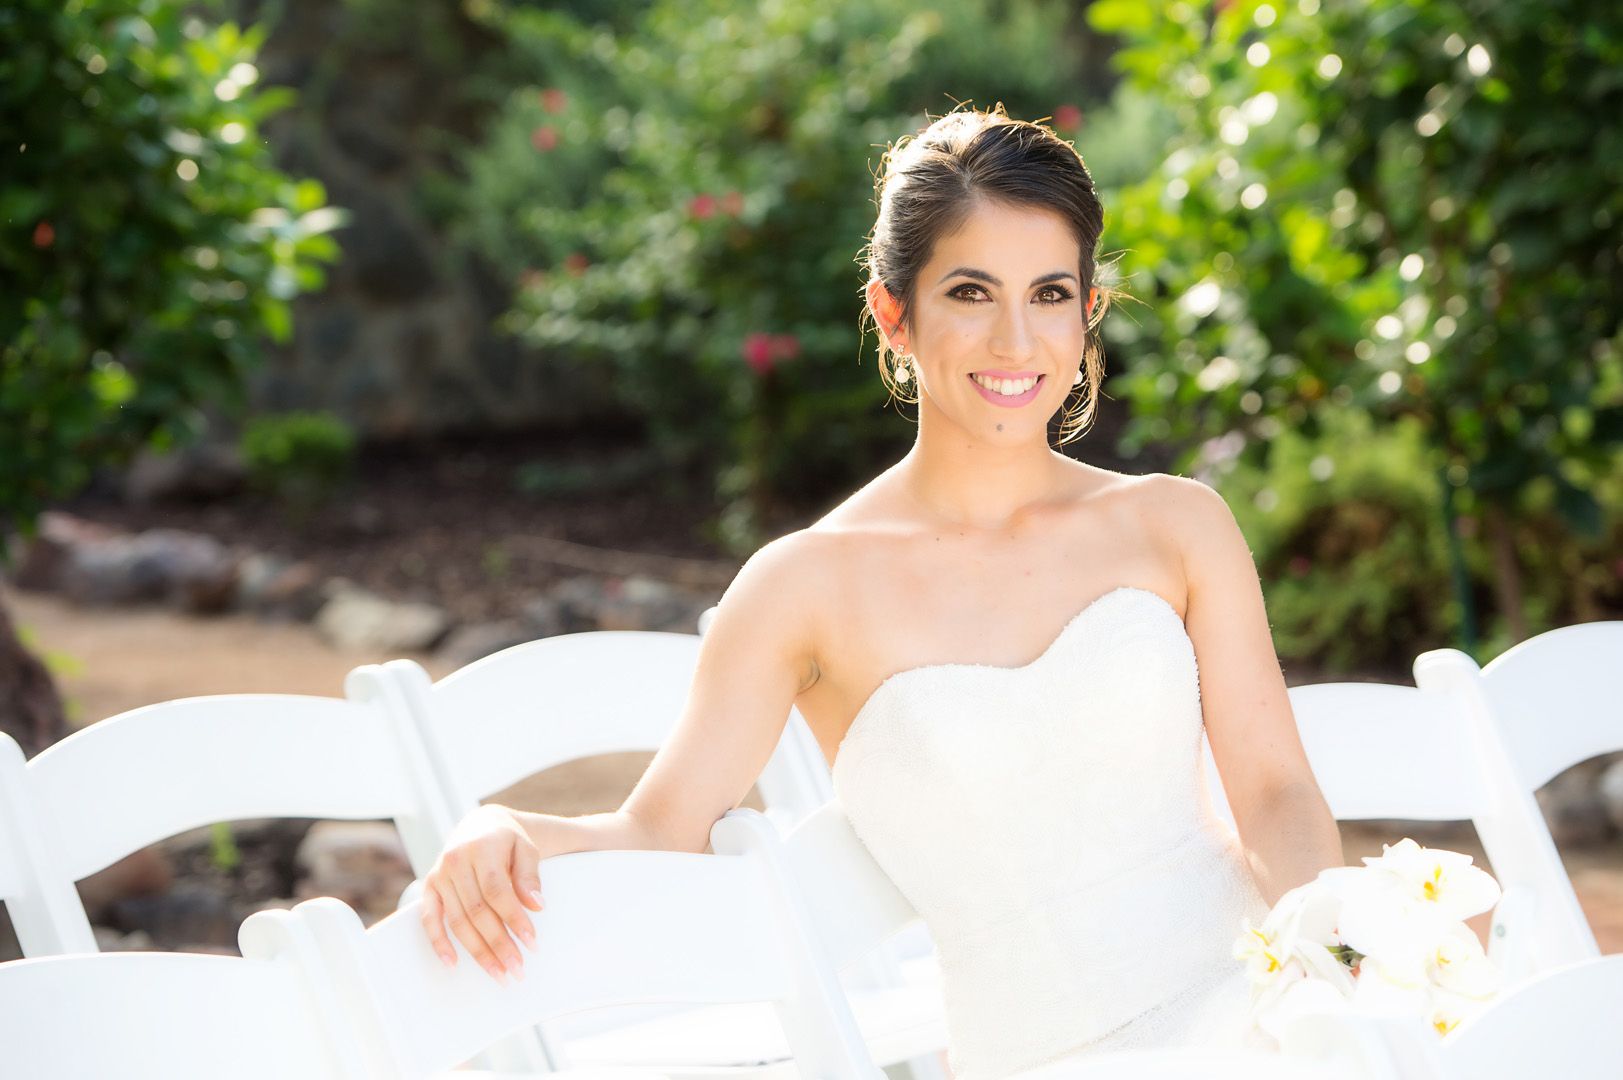 Wedding Venue, Event Venue - Kingan Gardens - Tucson, Az